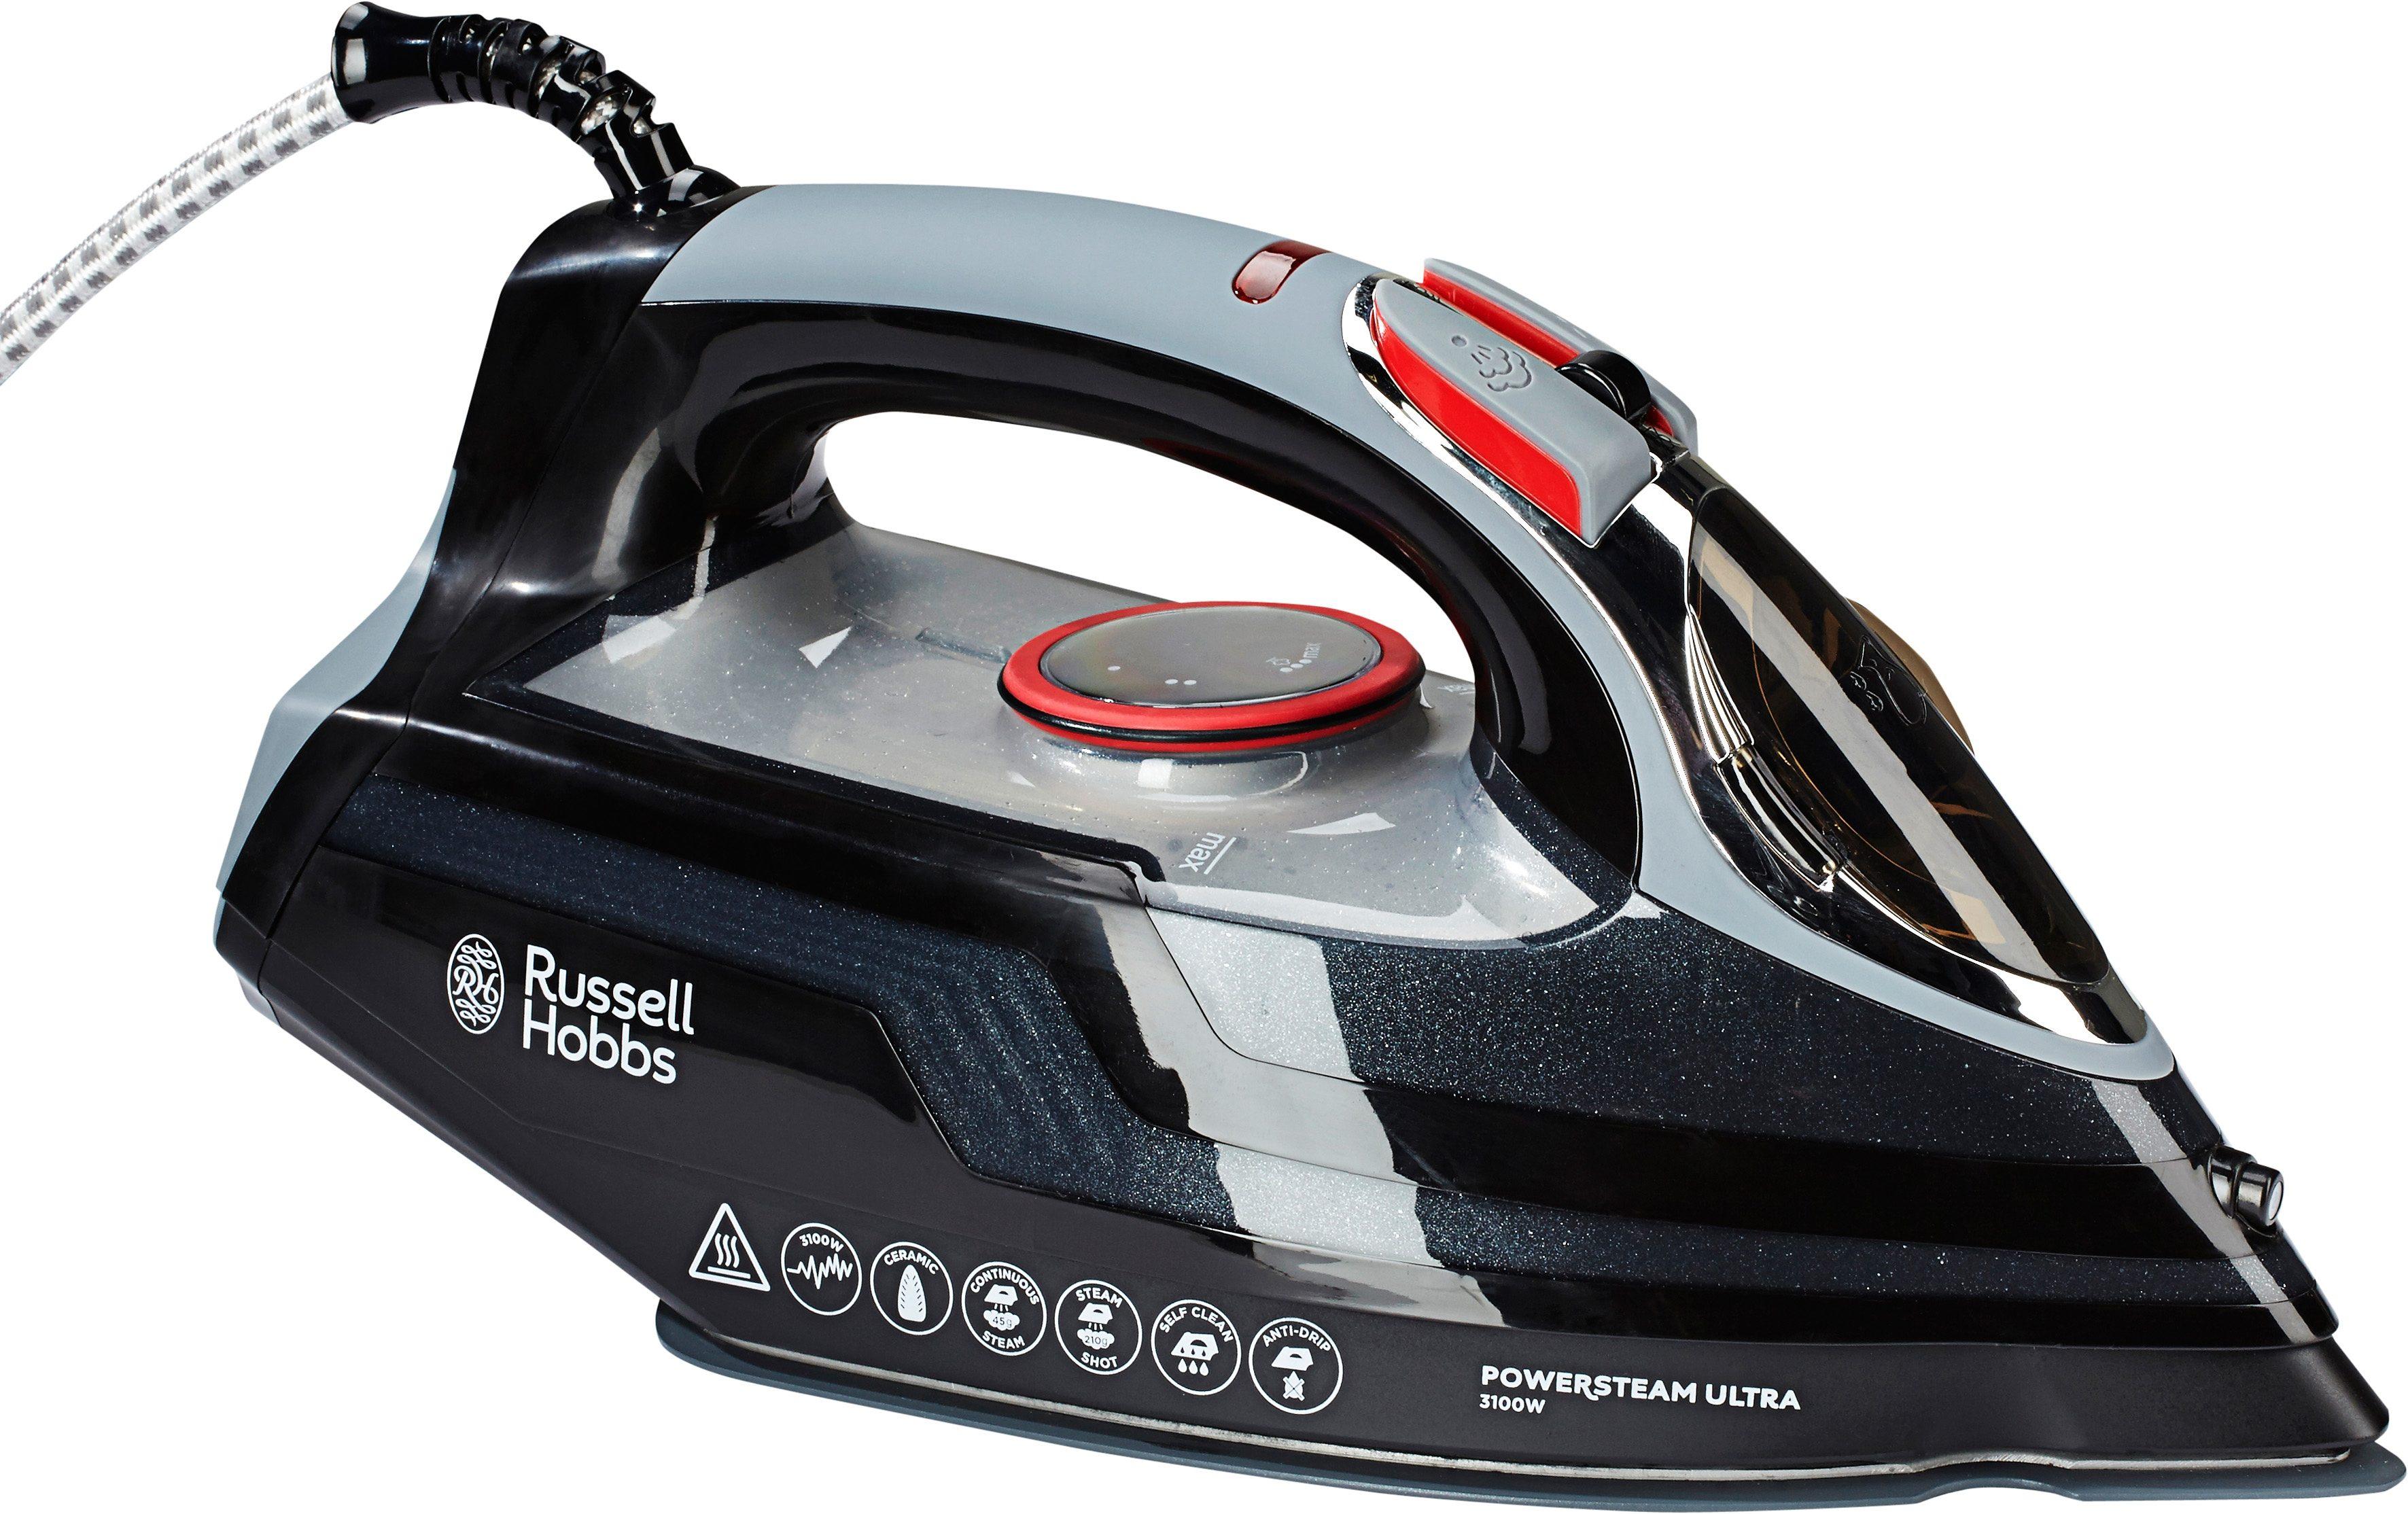 Russell Hobbs Bügeleisen »Power Steam Ultra« 20630-56, Keramiksohle, 3100 Watt